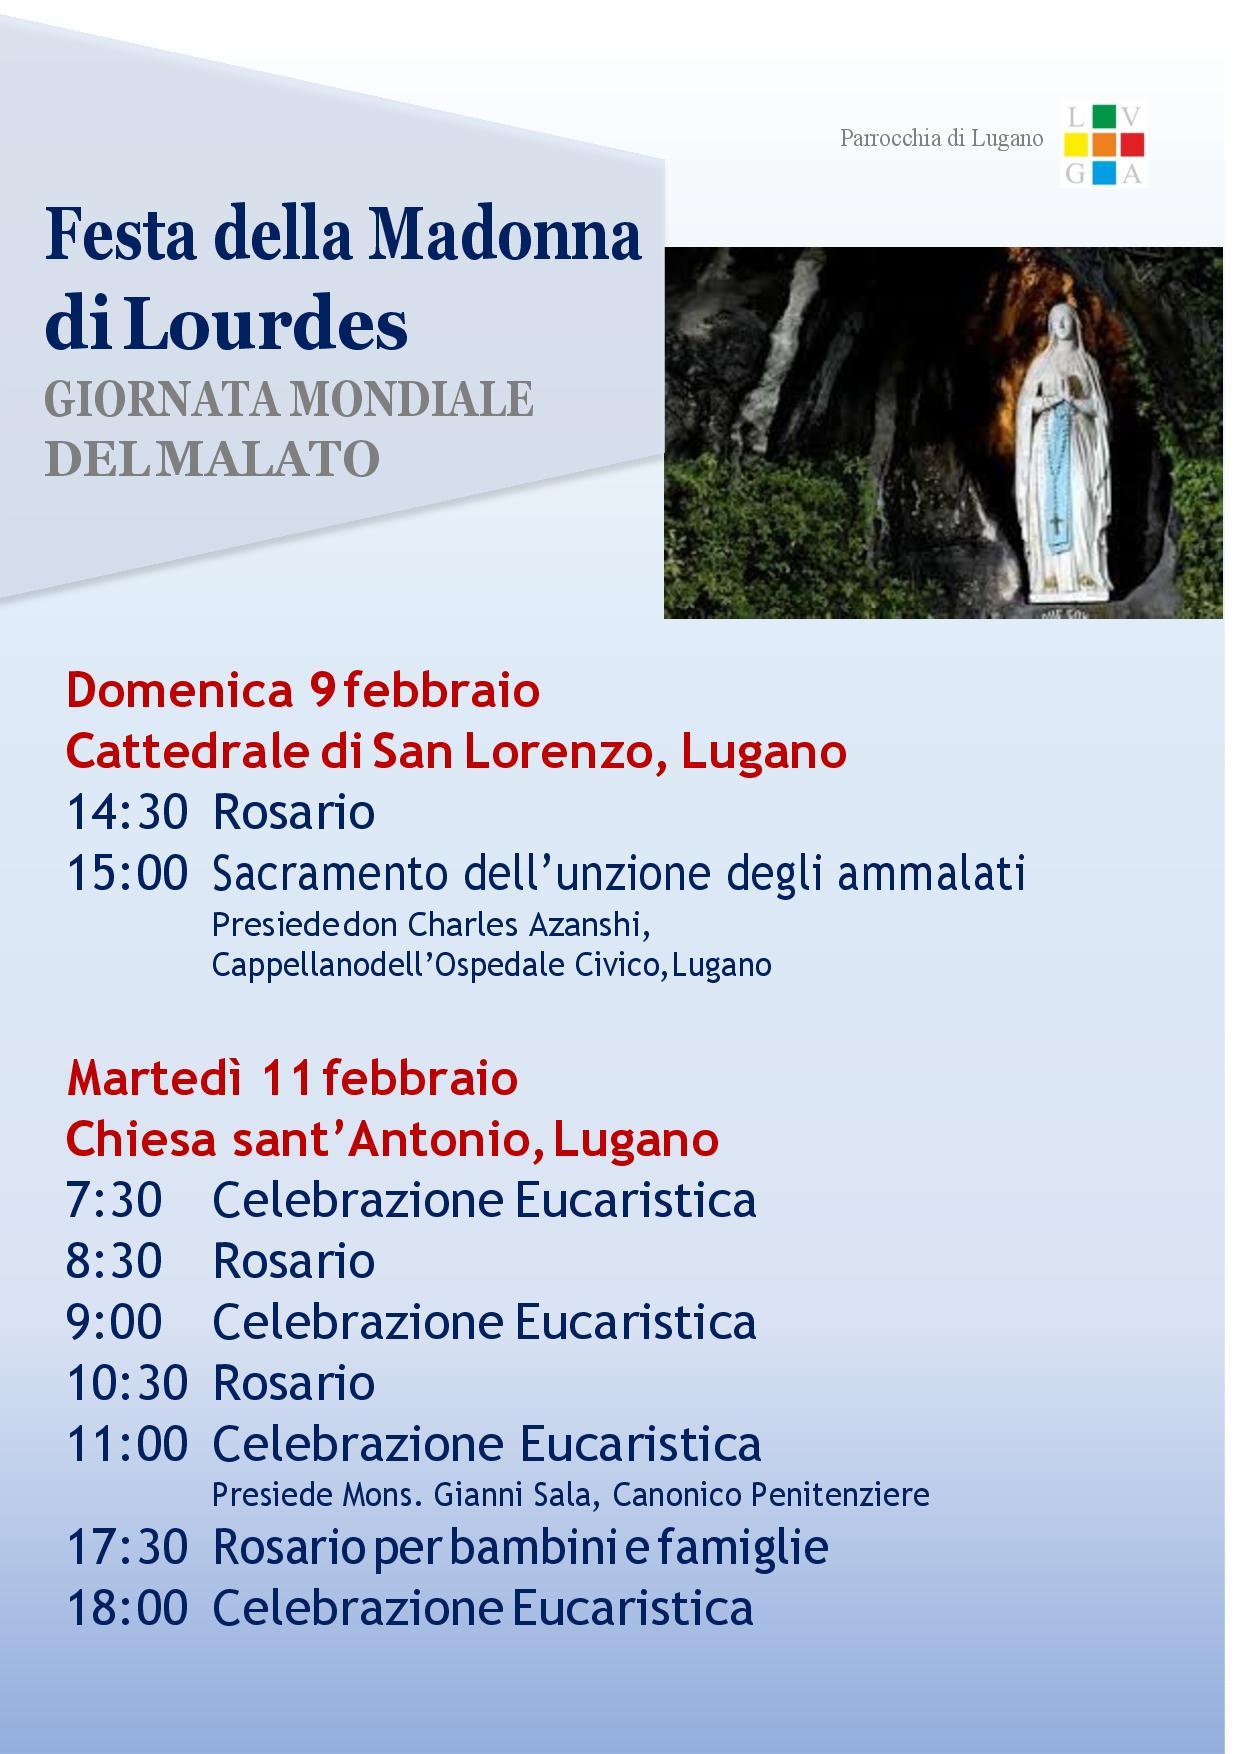 2020 - Lourdes - locandina completa-converted-page-001